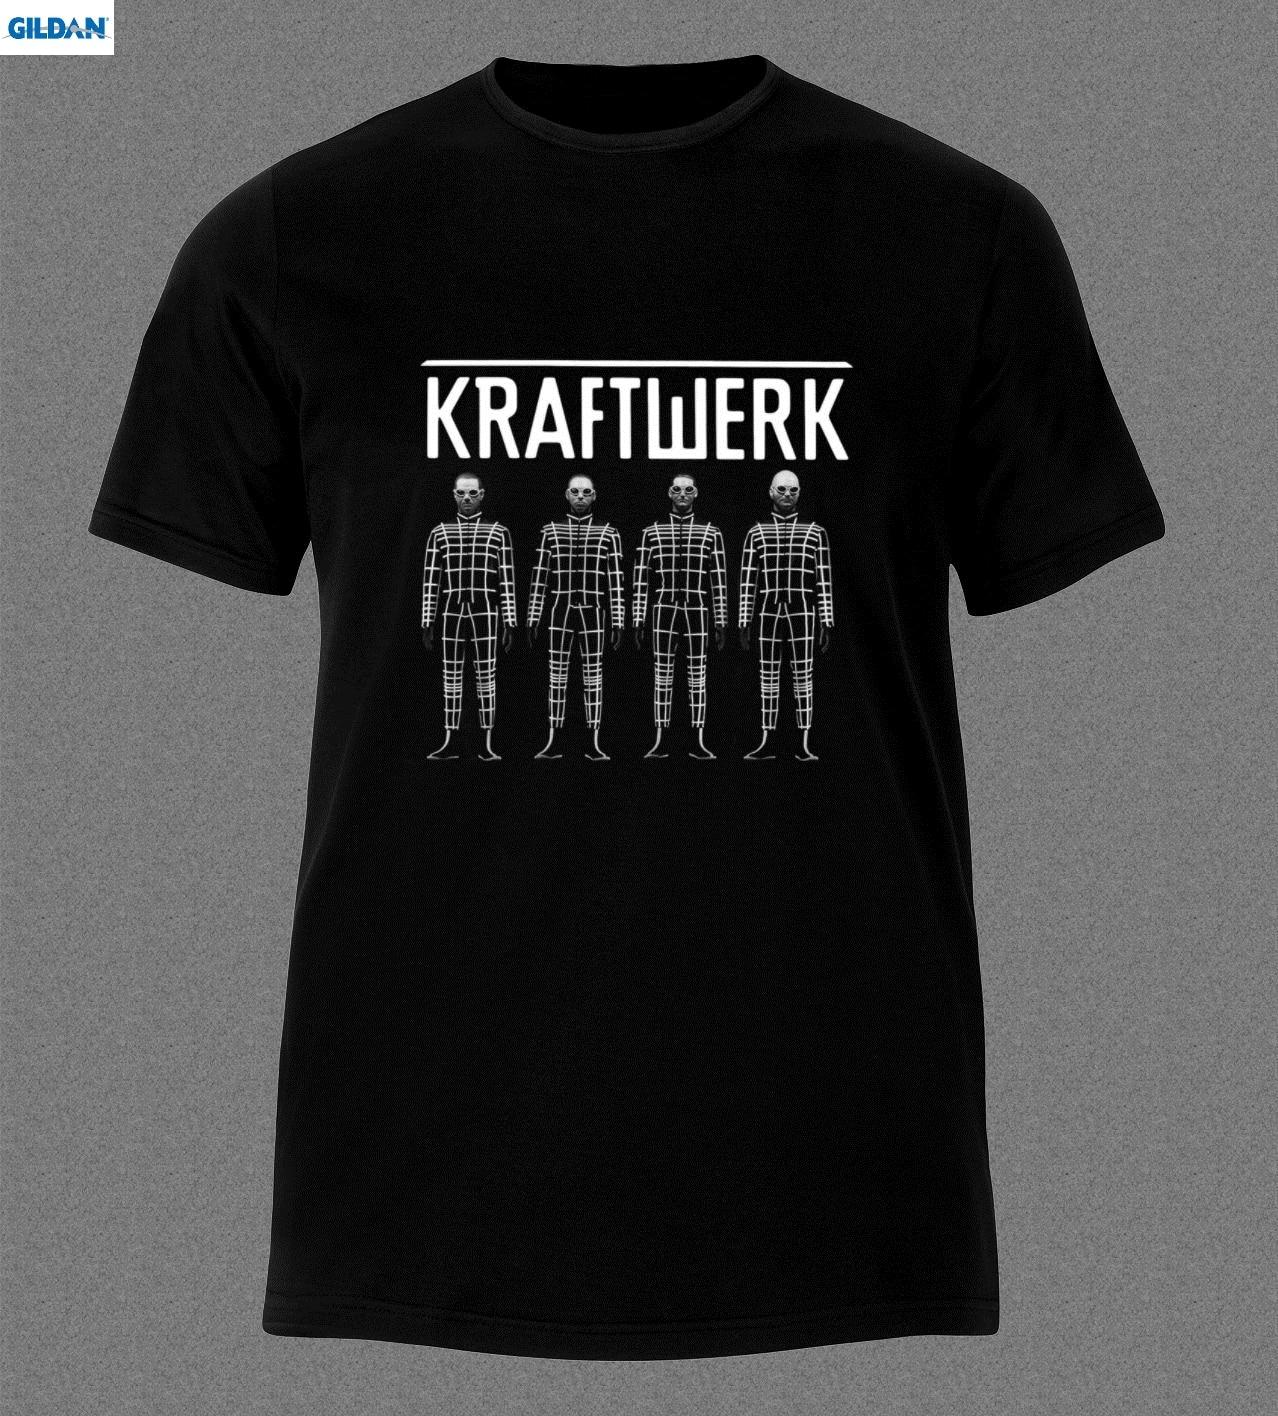 GILDAN KRAFTWERK BAND ELECTRONIC ART POP MUSIC GERMAN T-Shirt Stranger Things Print T Original Tee Hipster O-Neck